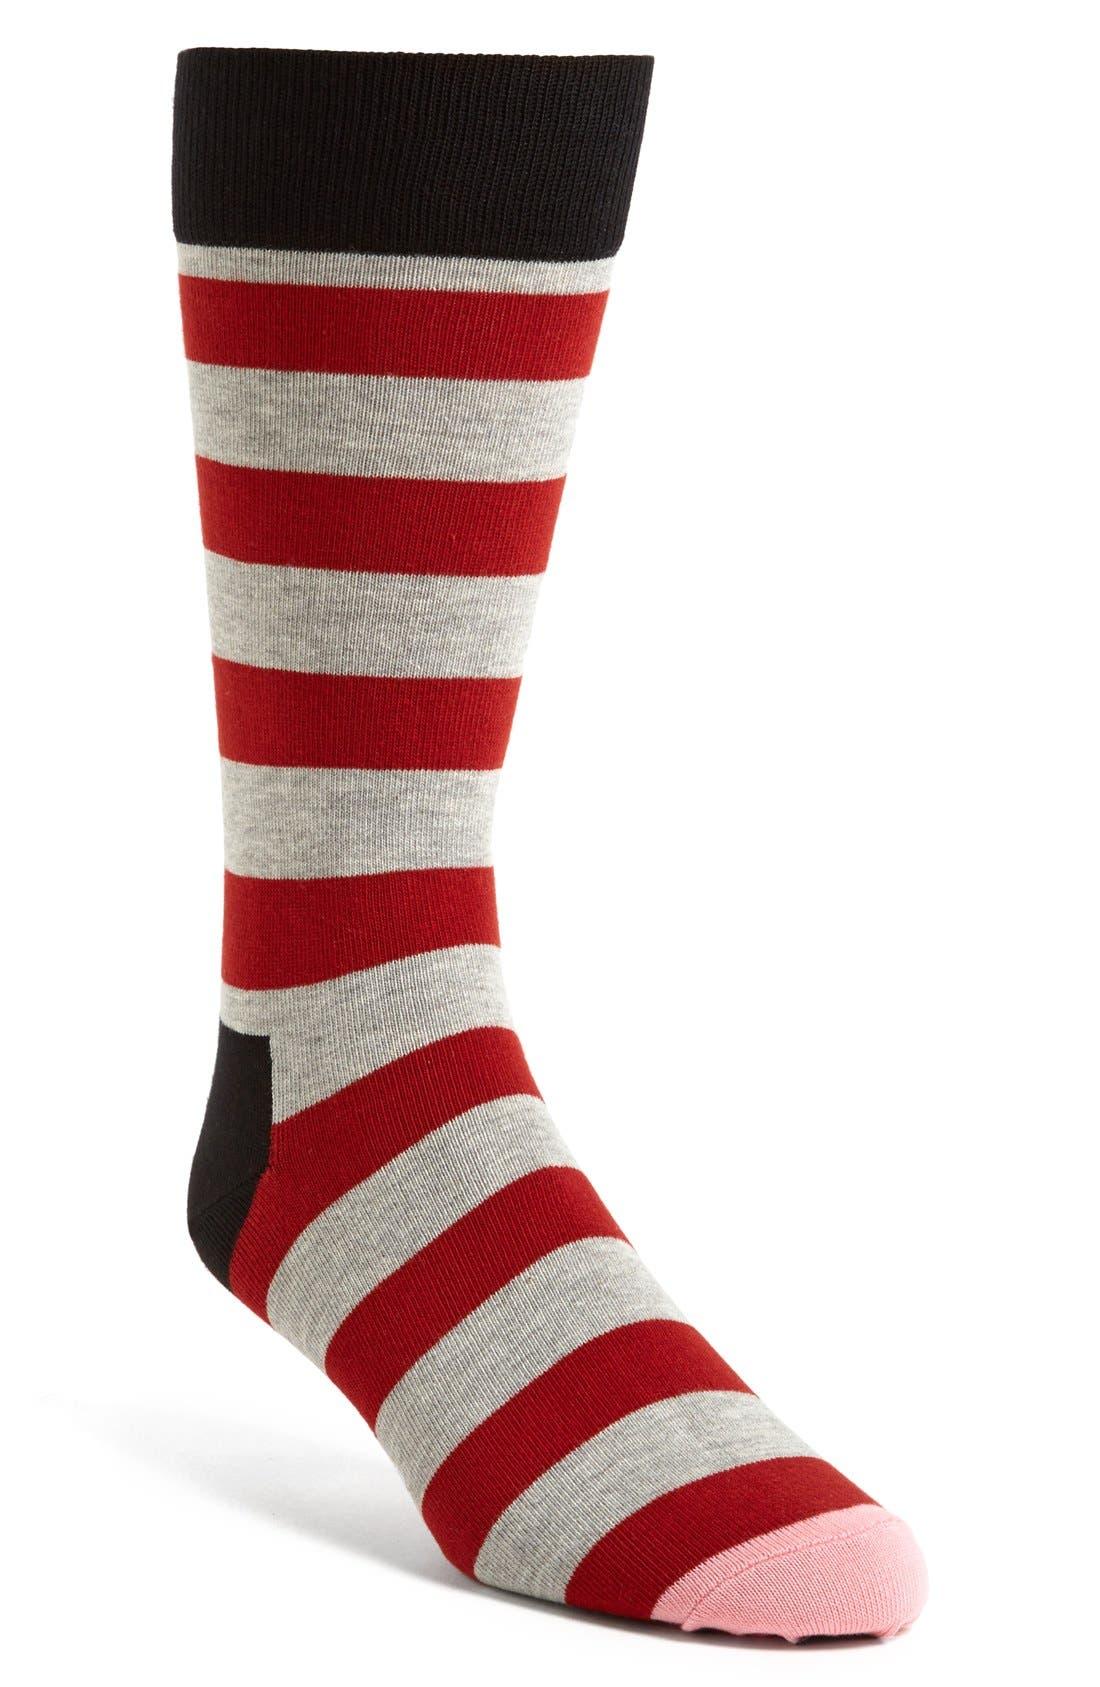 Main Image - Happy Socks Patterned Socks